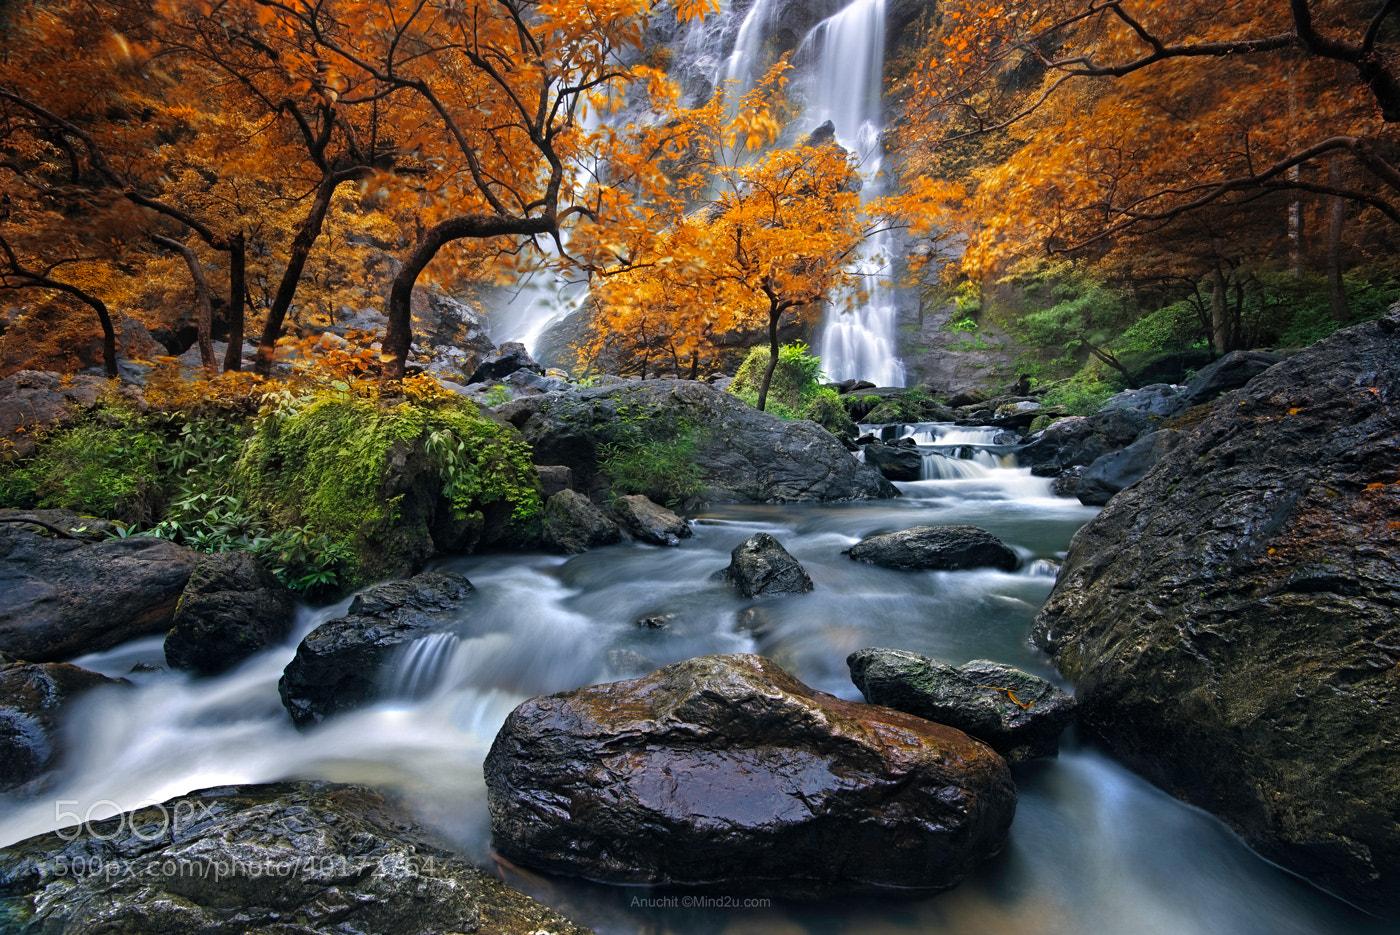 Photograph Waterfall 2 by Anuchit นายบันทึก on 500px